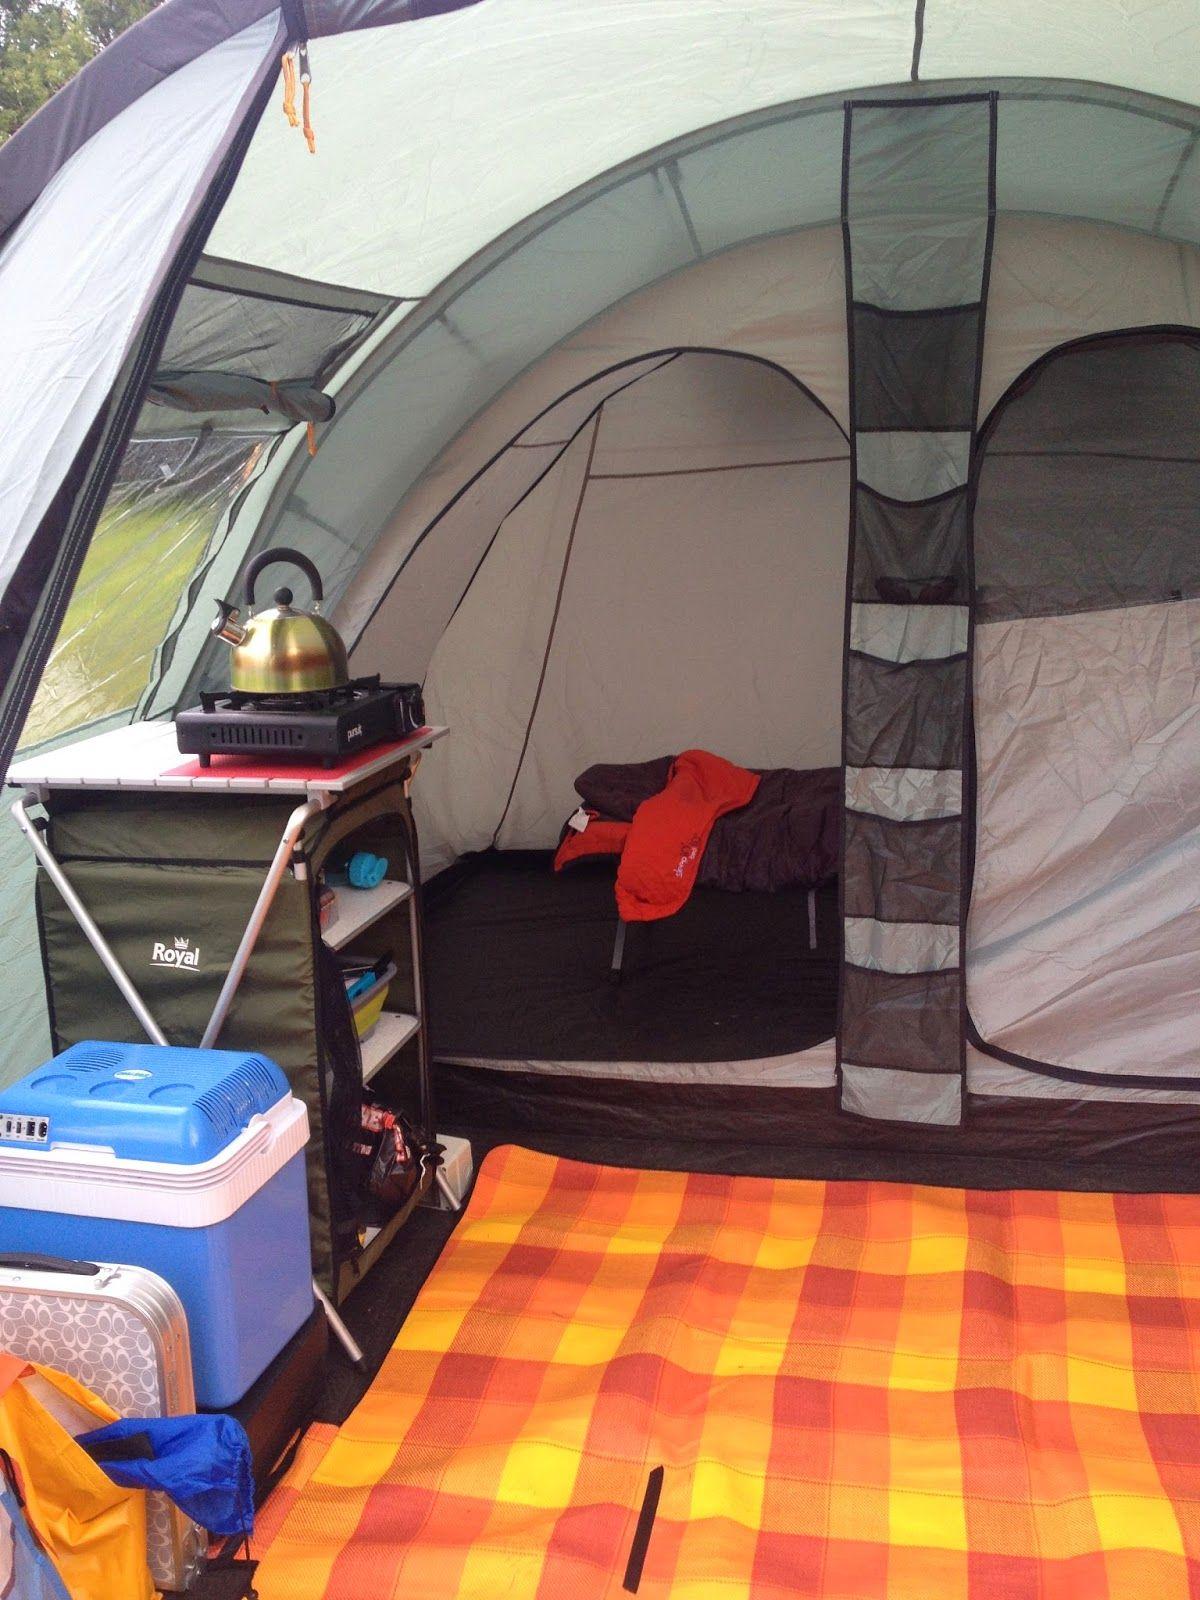 Campervic Camping decor, Camping glamping, Camping furniture